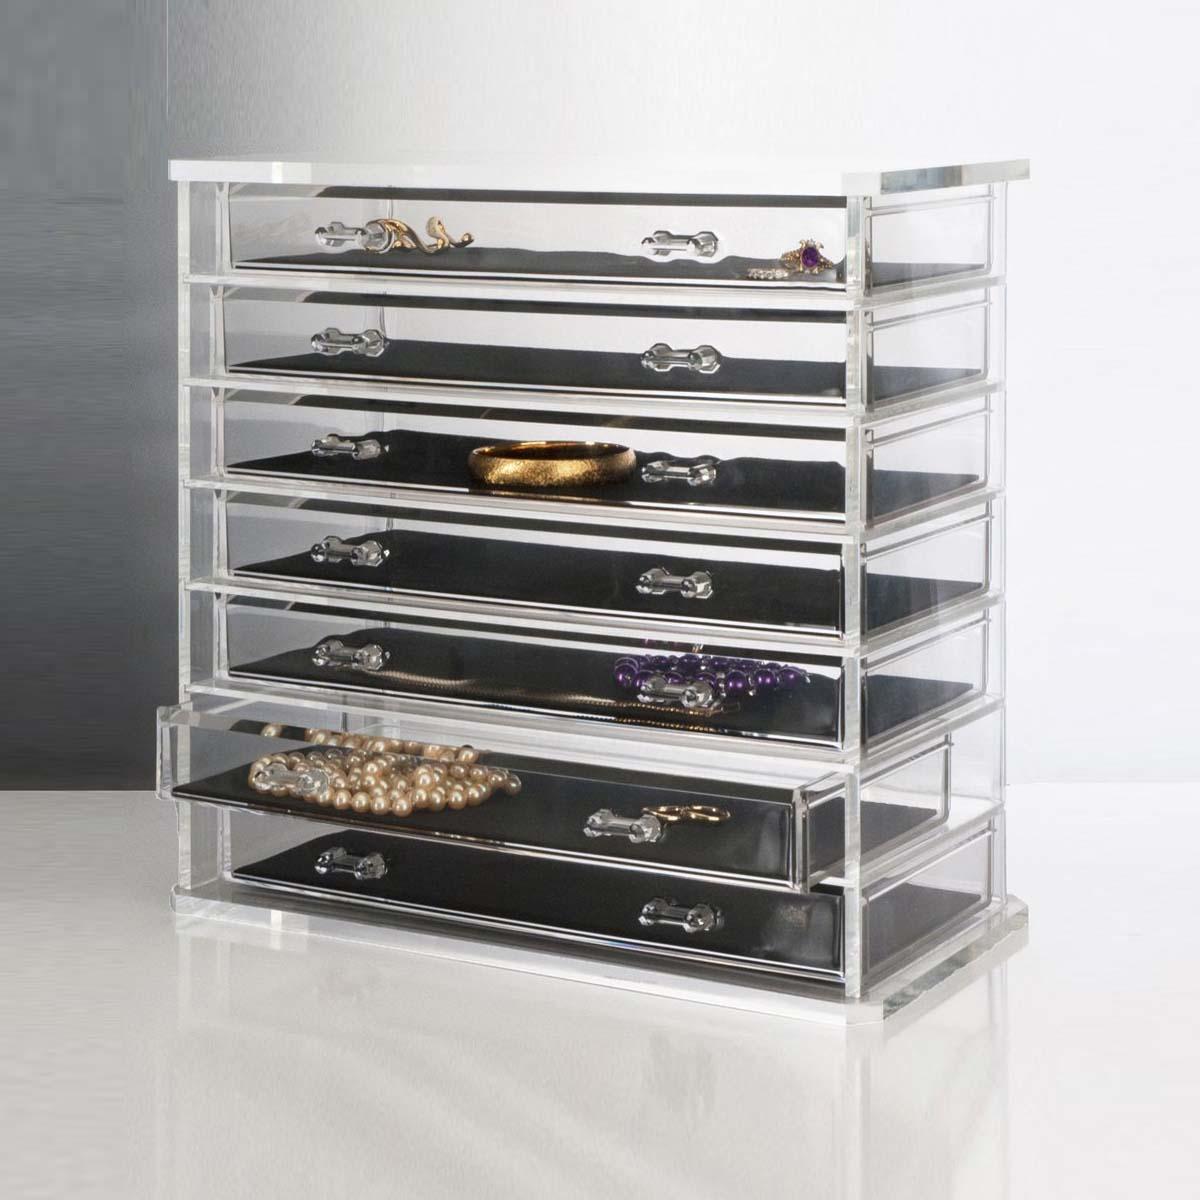 7 Layers Jewellery Showcase